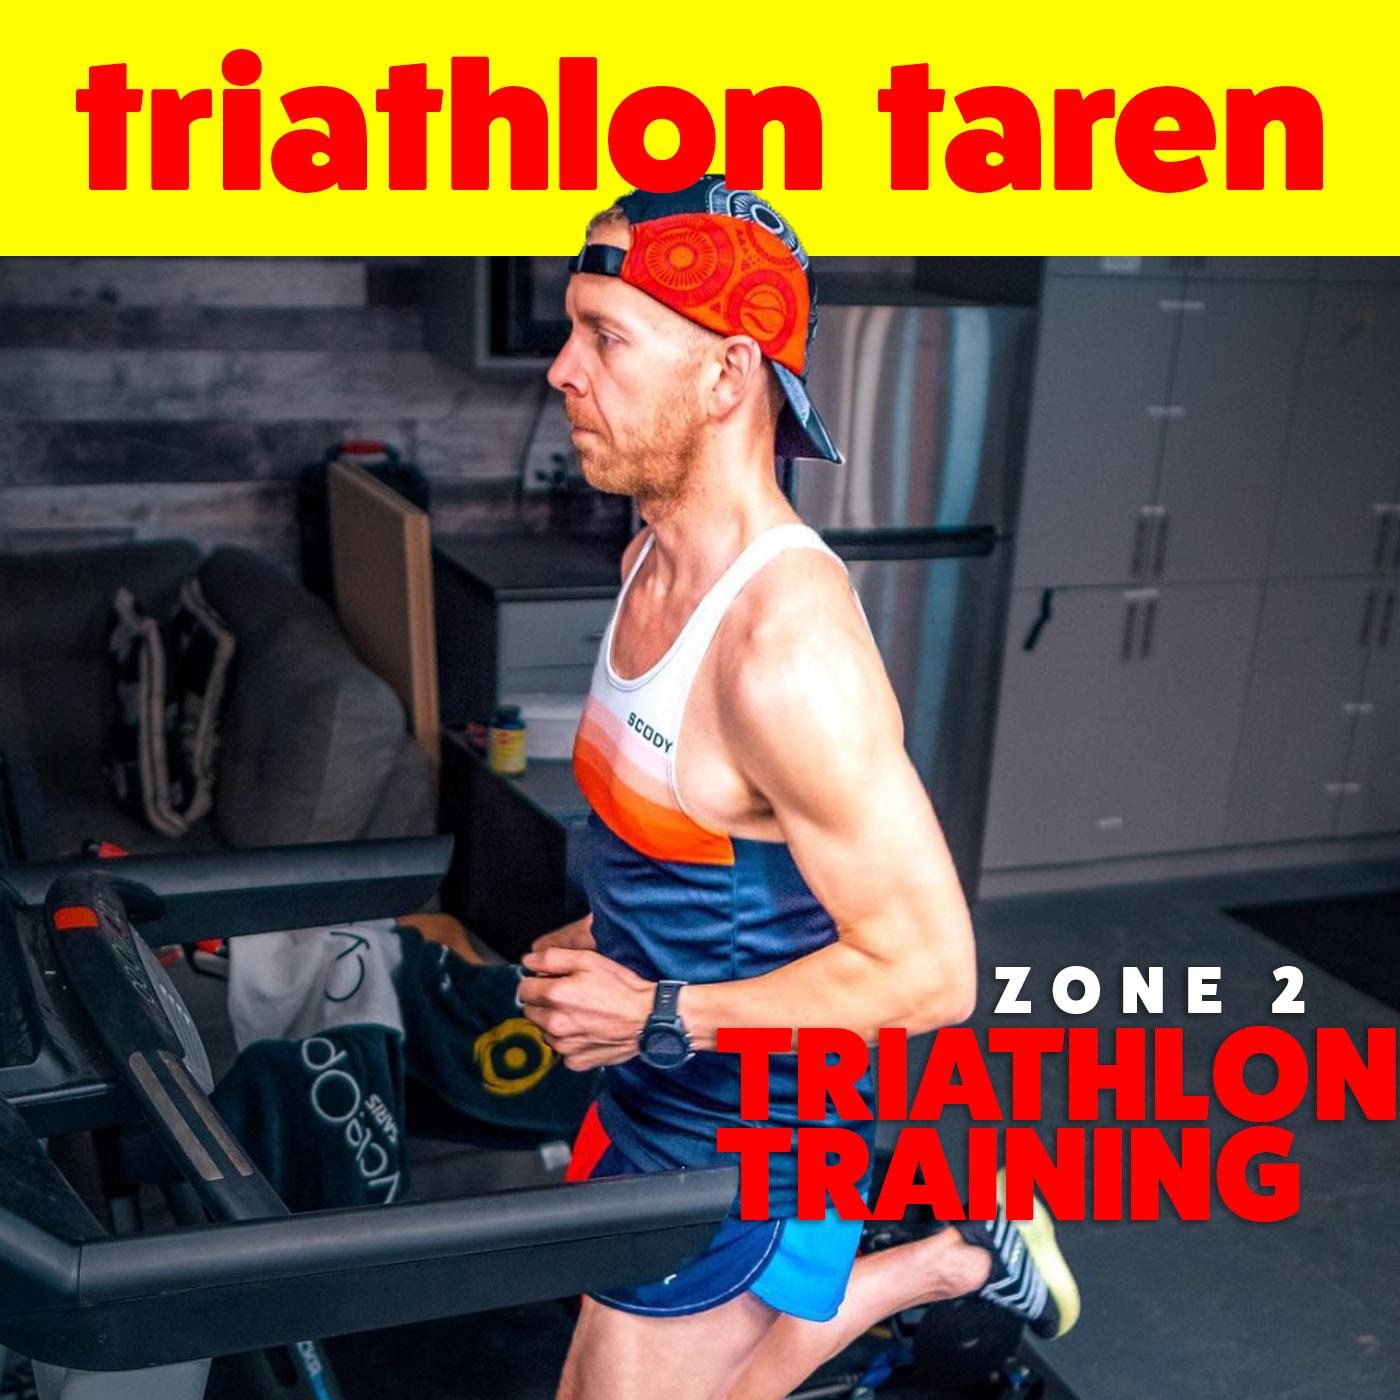 zone 2 triathlon training